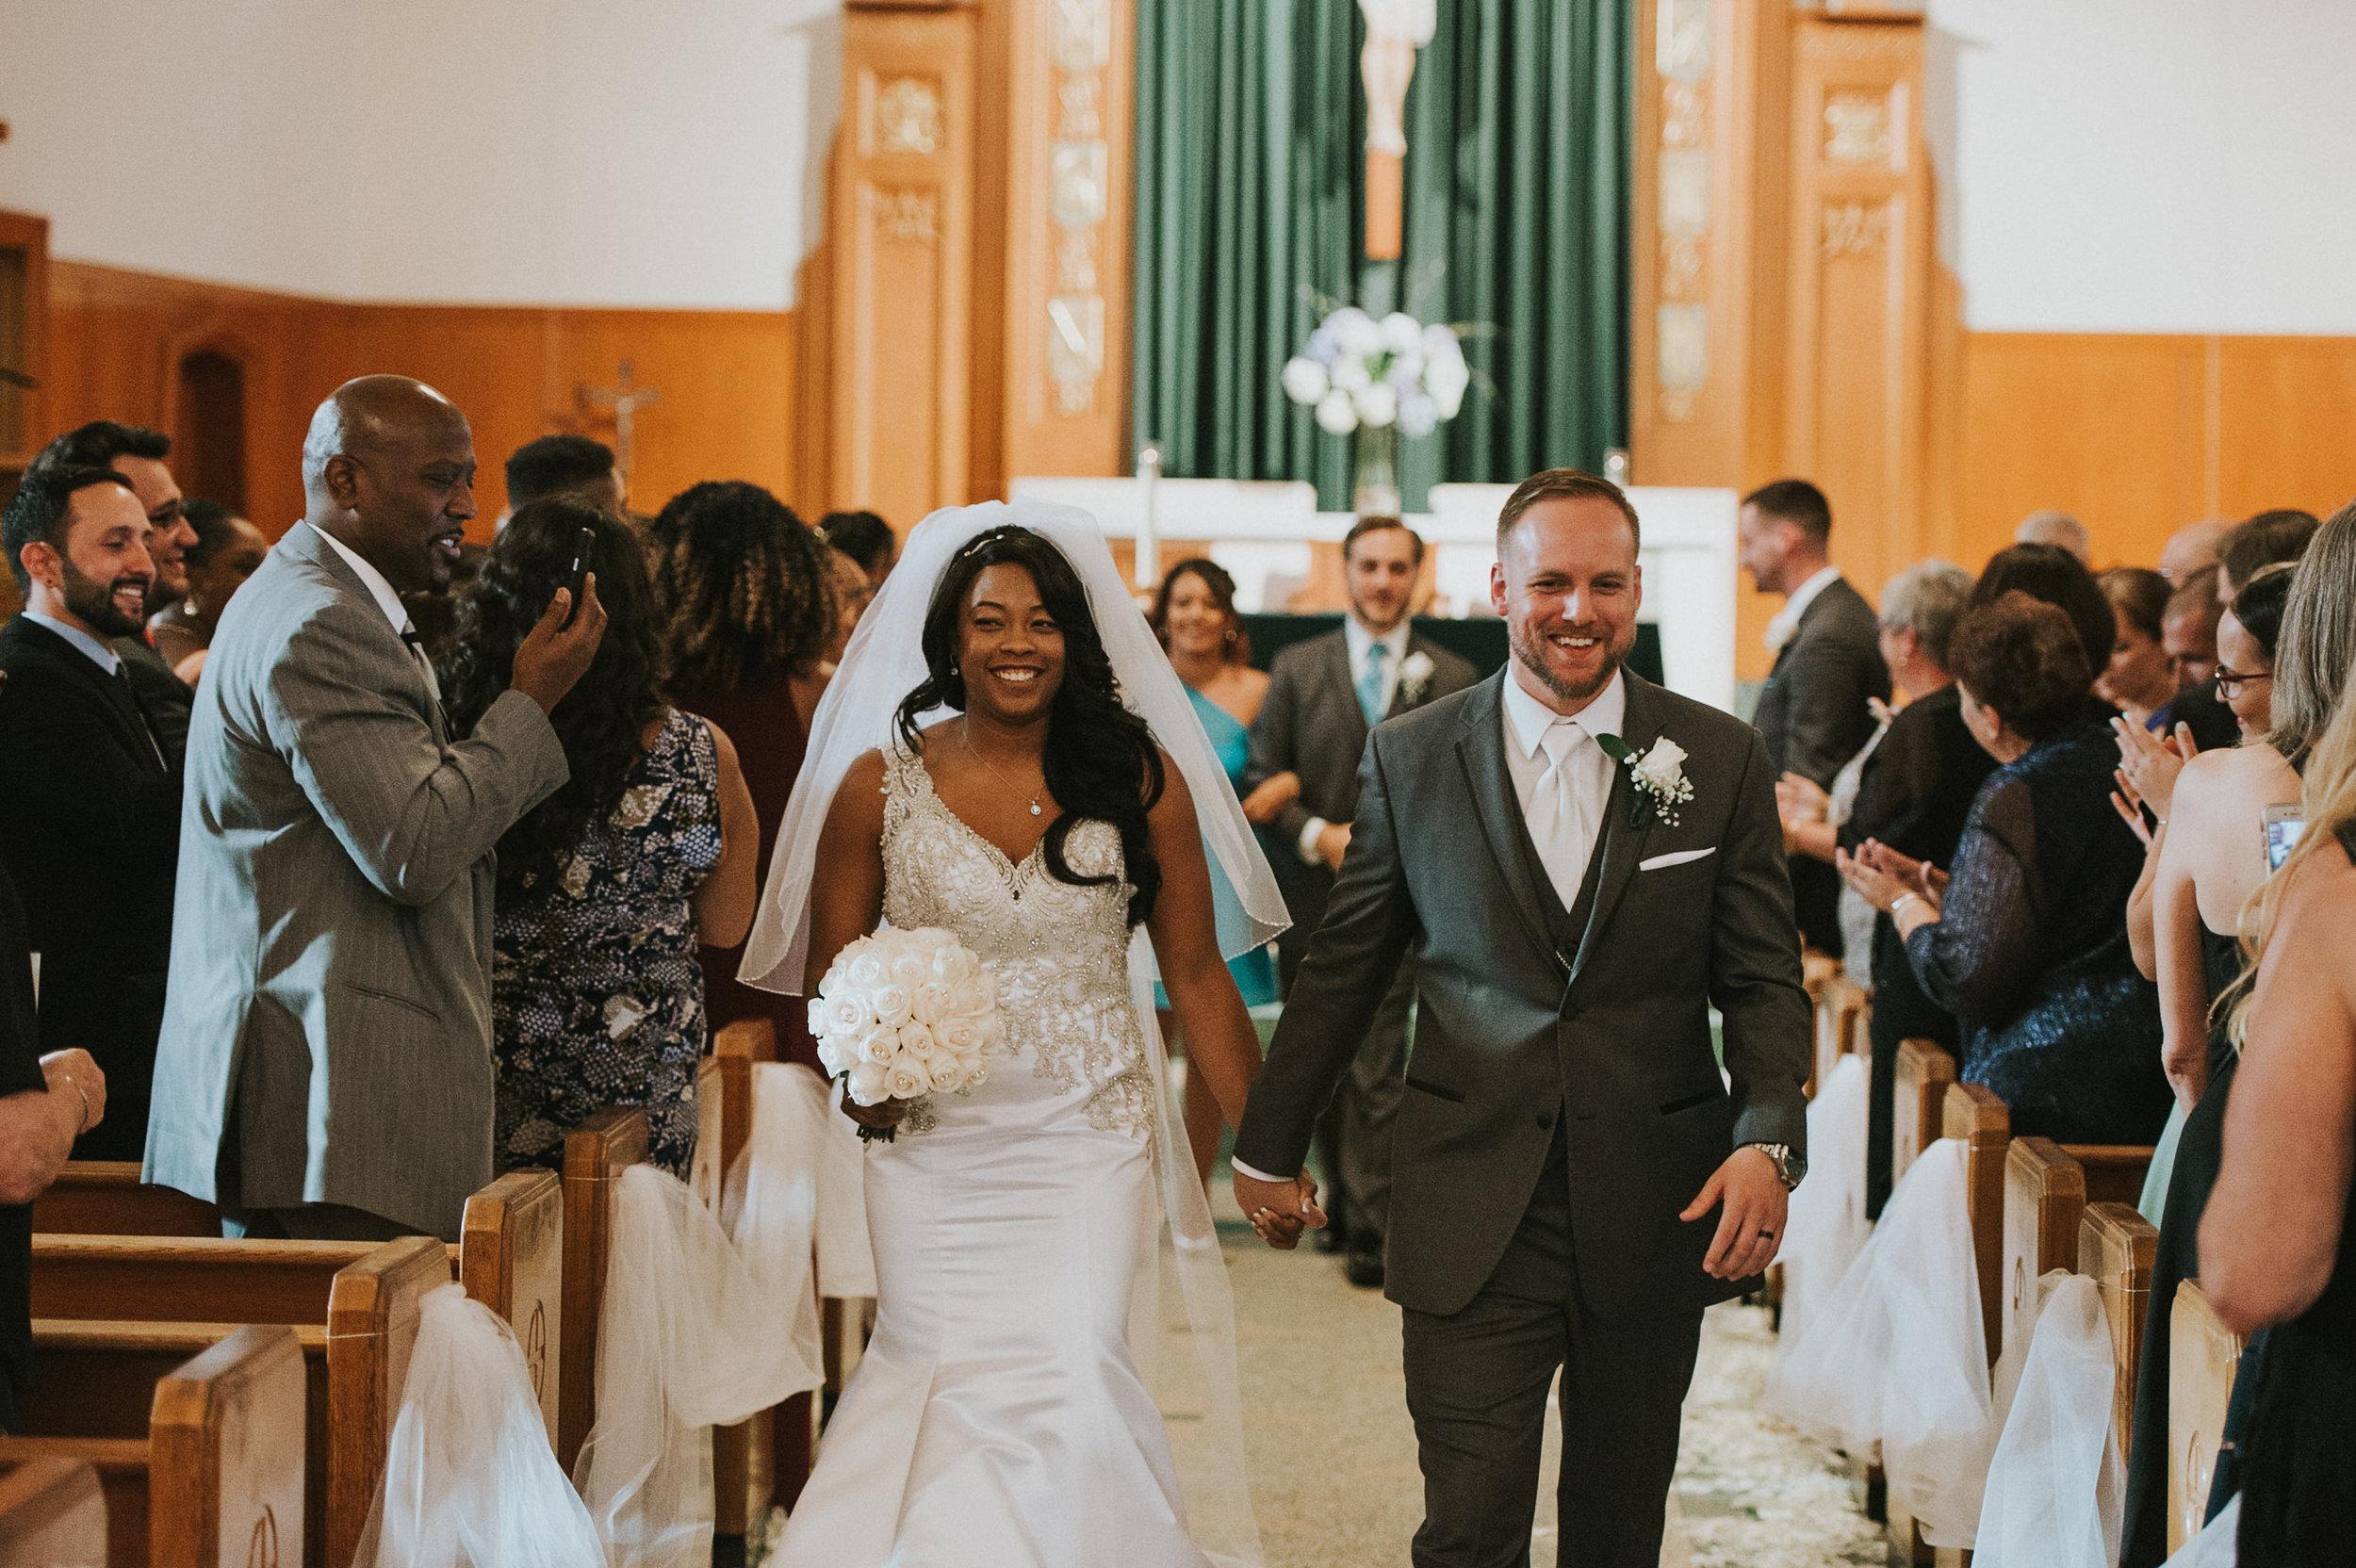 Tiana-and-Danny-Wedding-489.jpg